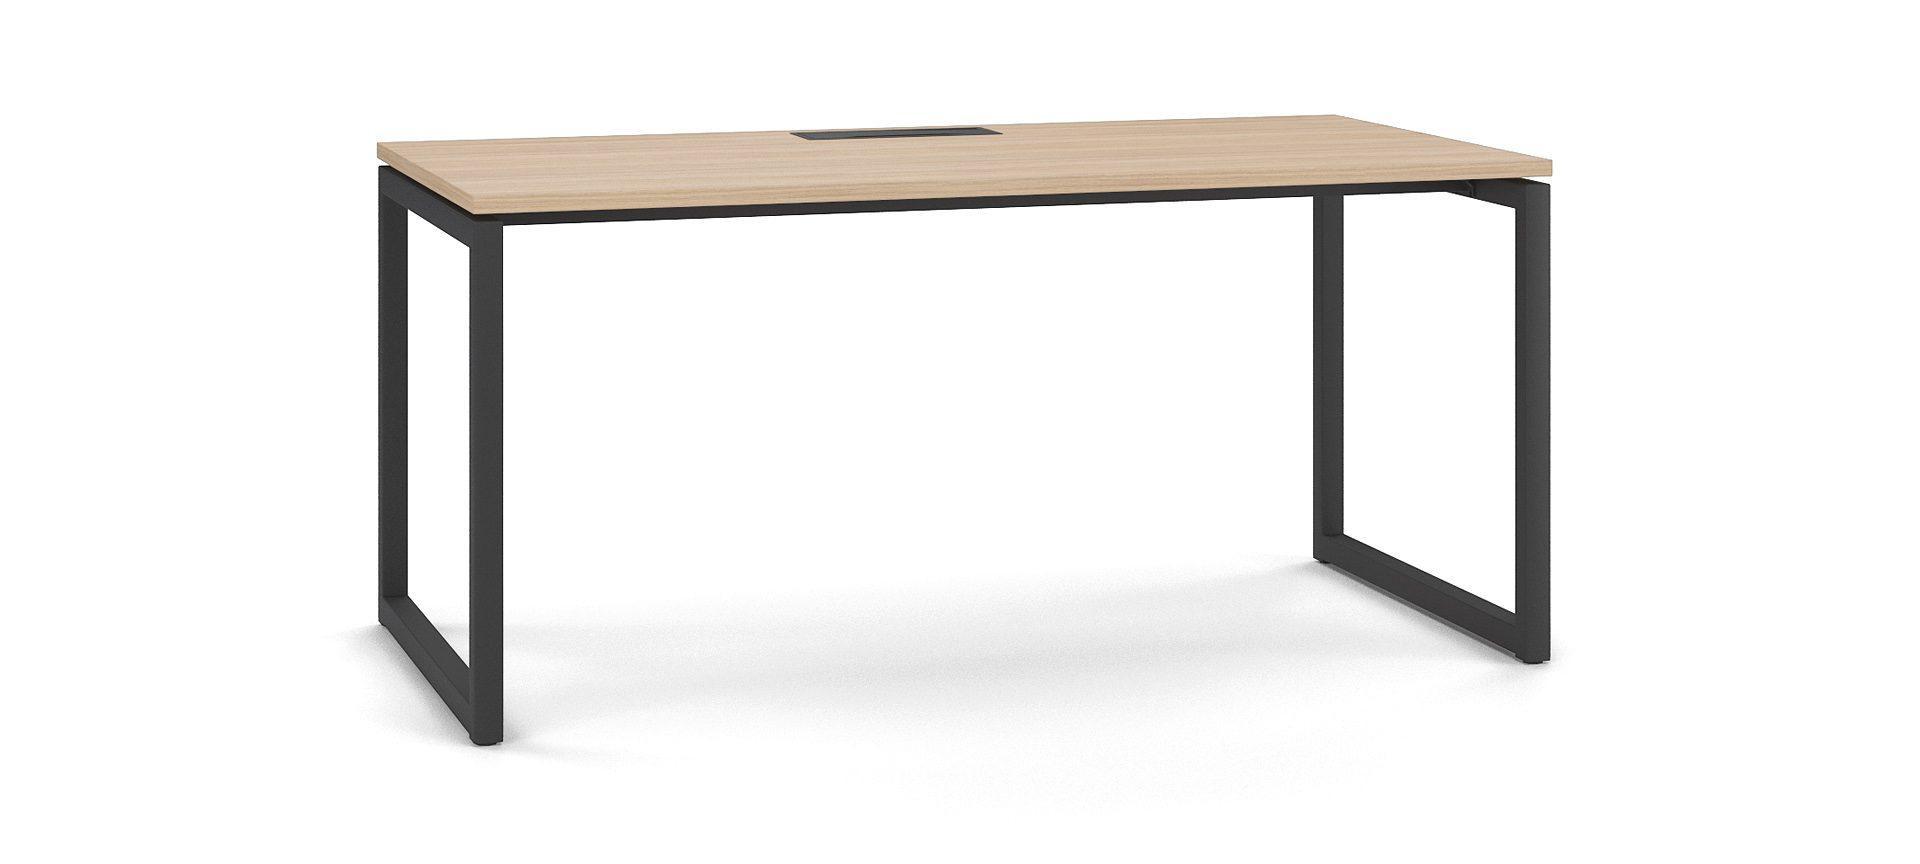 Single-desks-NOVA-O-Narbutas-1920x864.jp